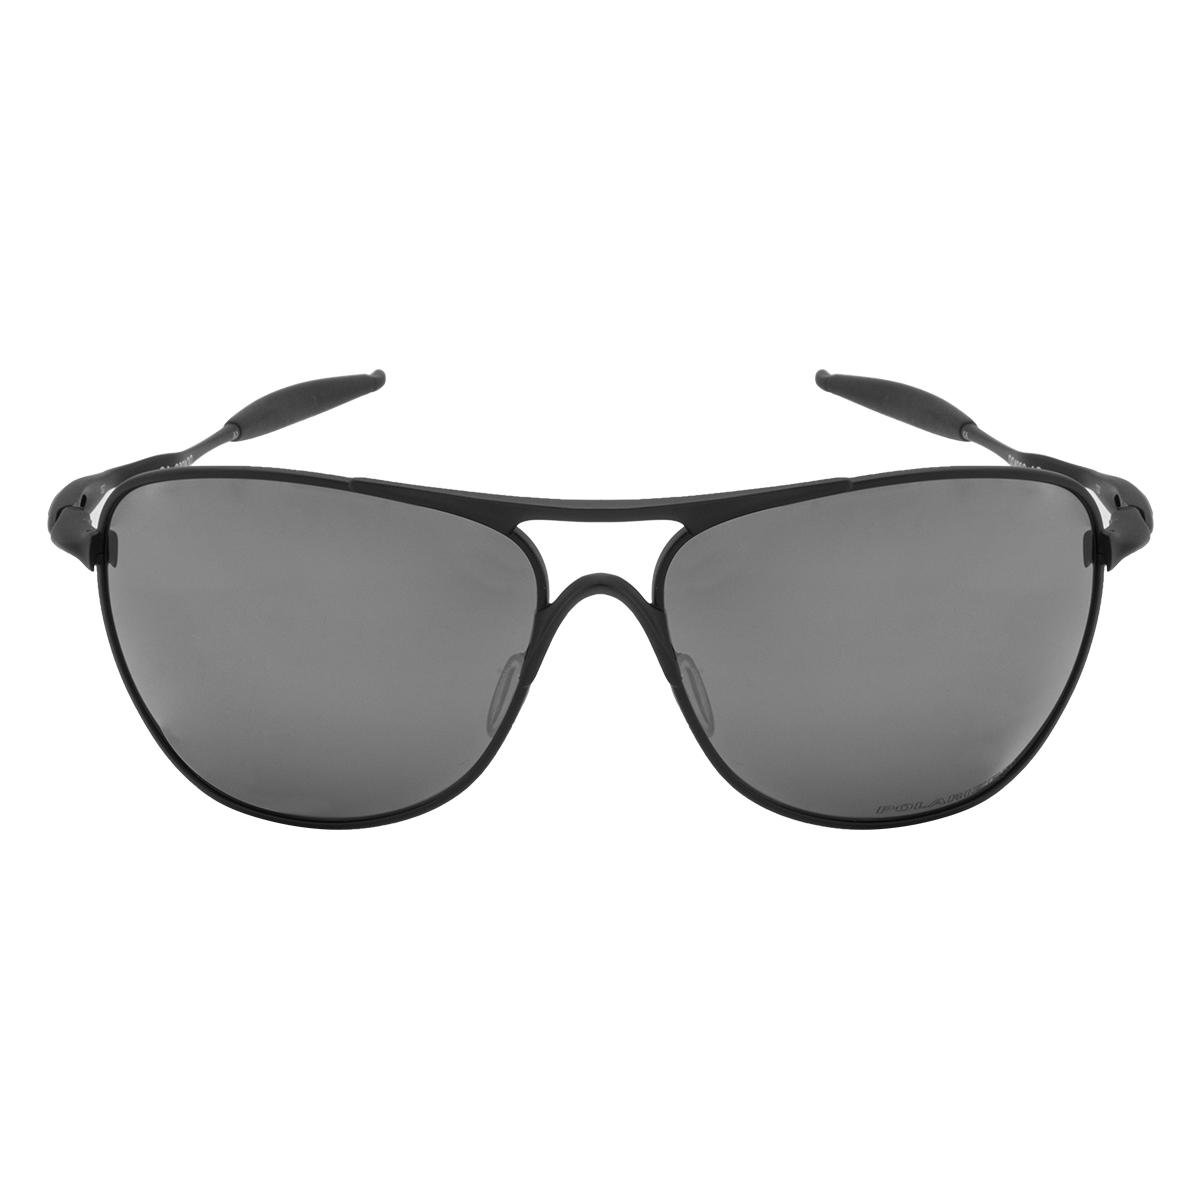 Óculos de Sol Oakley Crosshair Matte Black   Black Iridium Polarized -  10 61 ... 1f13b89cb3